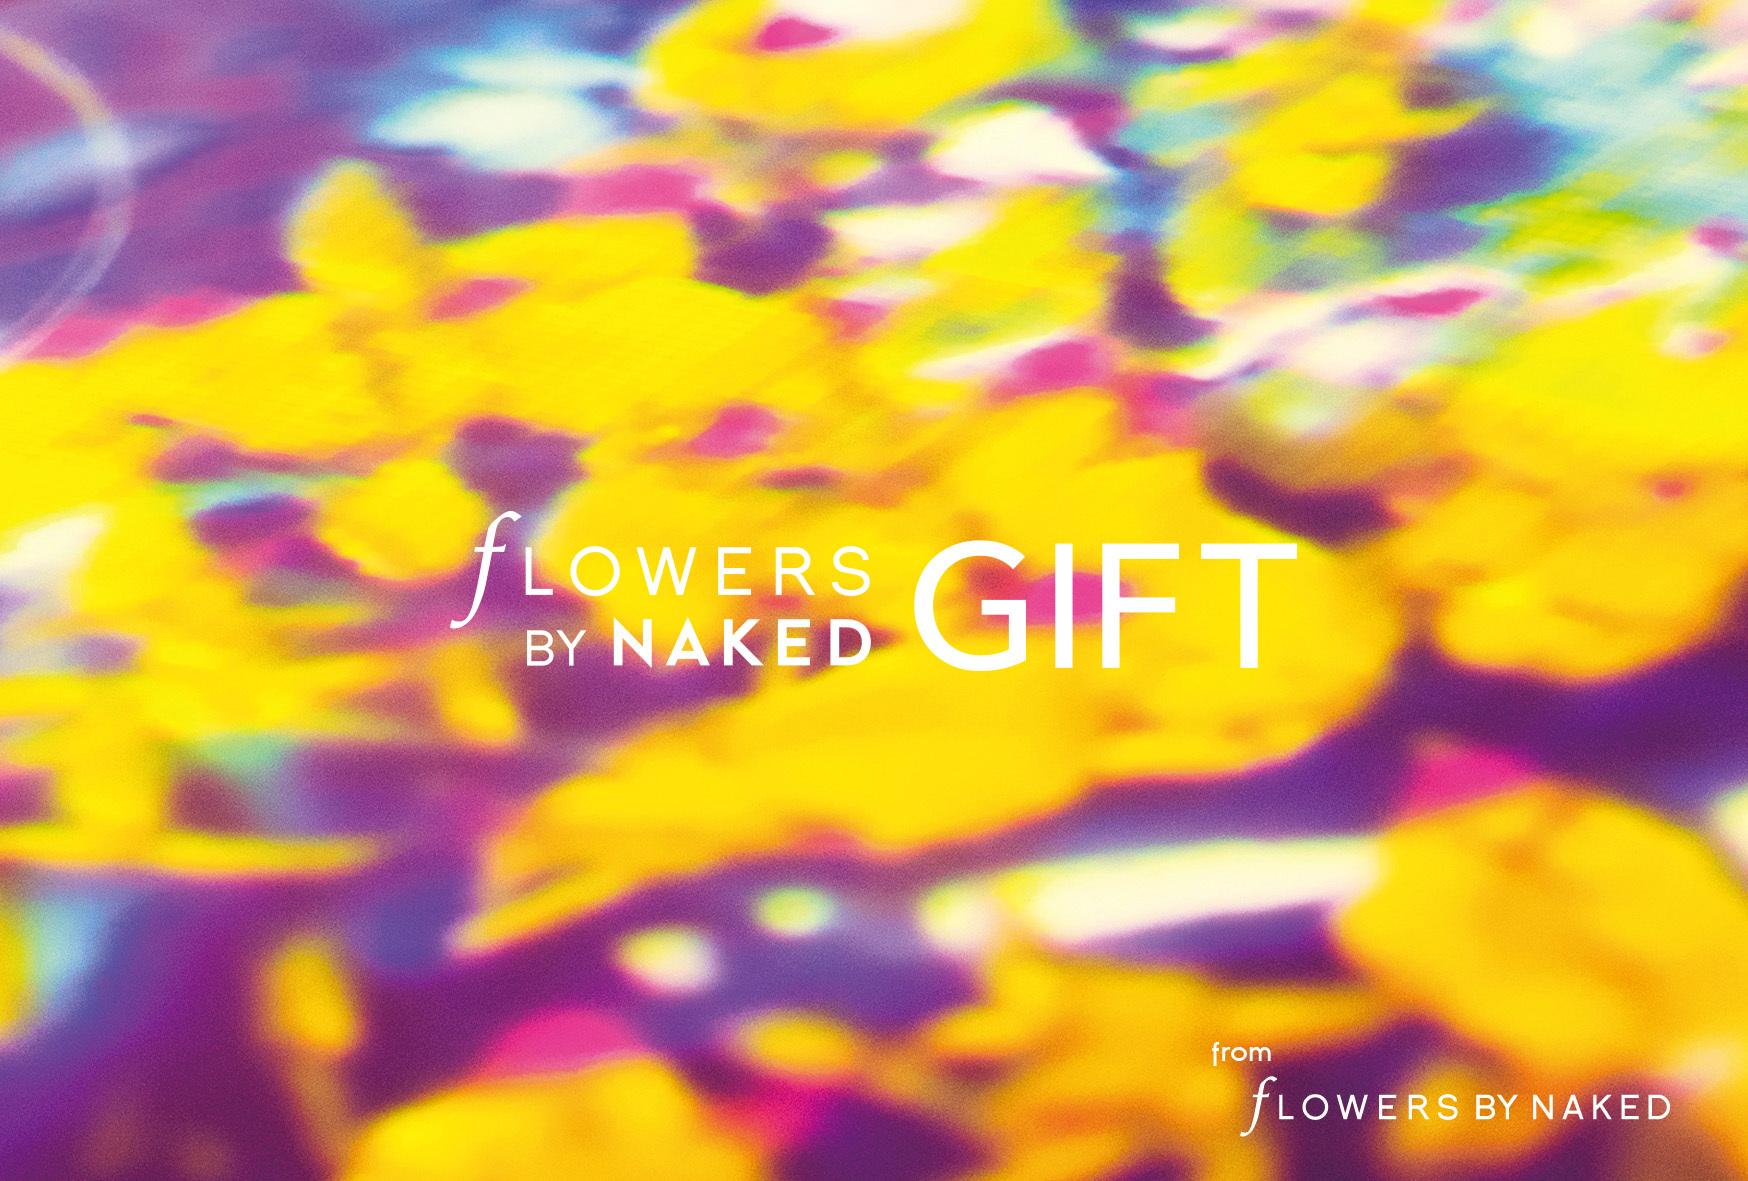 FLOWERS BY NAKEDのアート体験を贈るギフトキットが販売開始